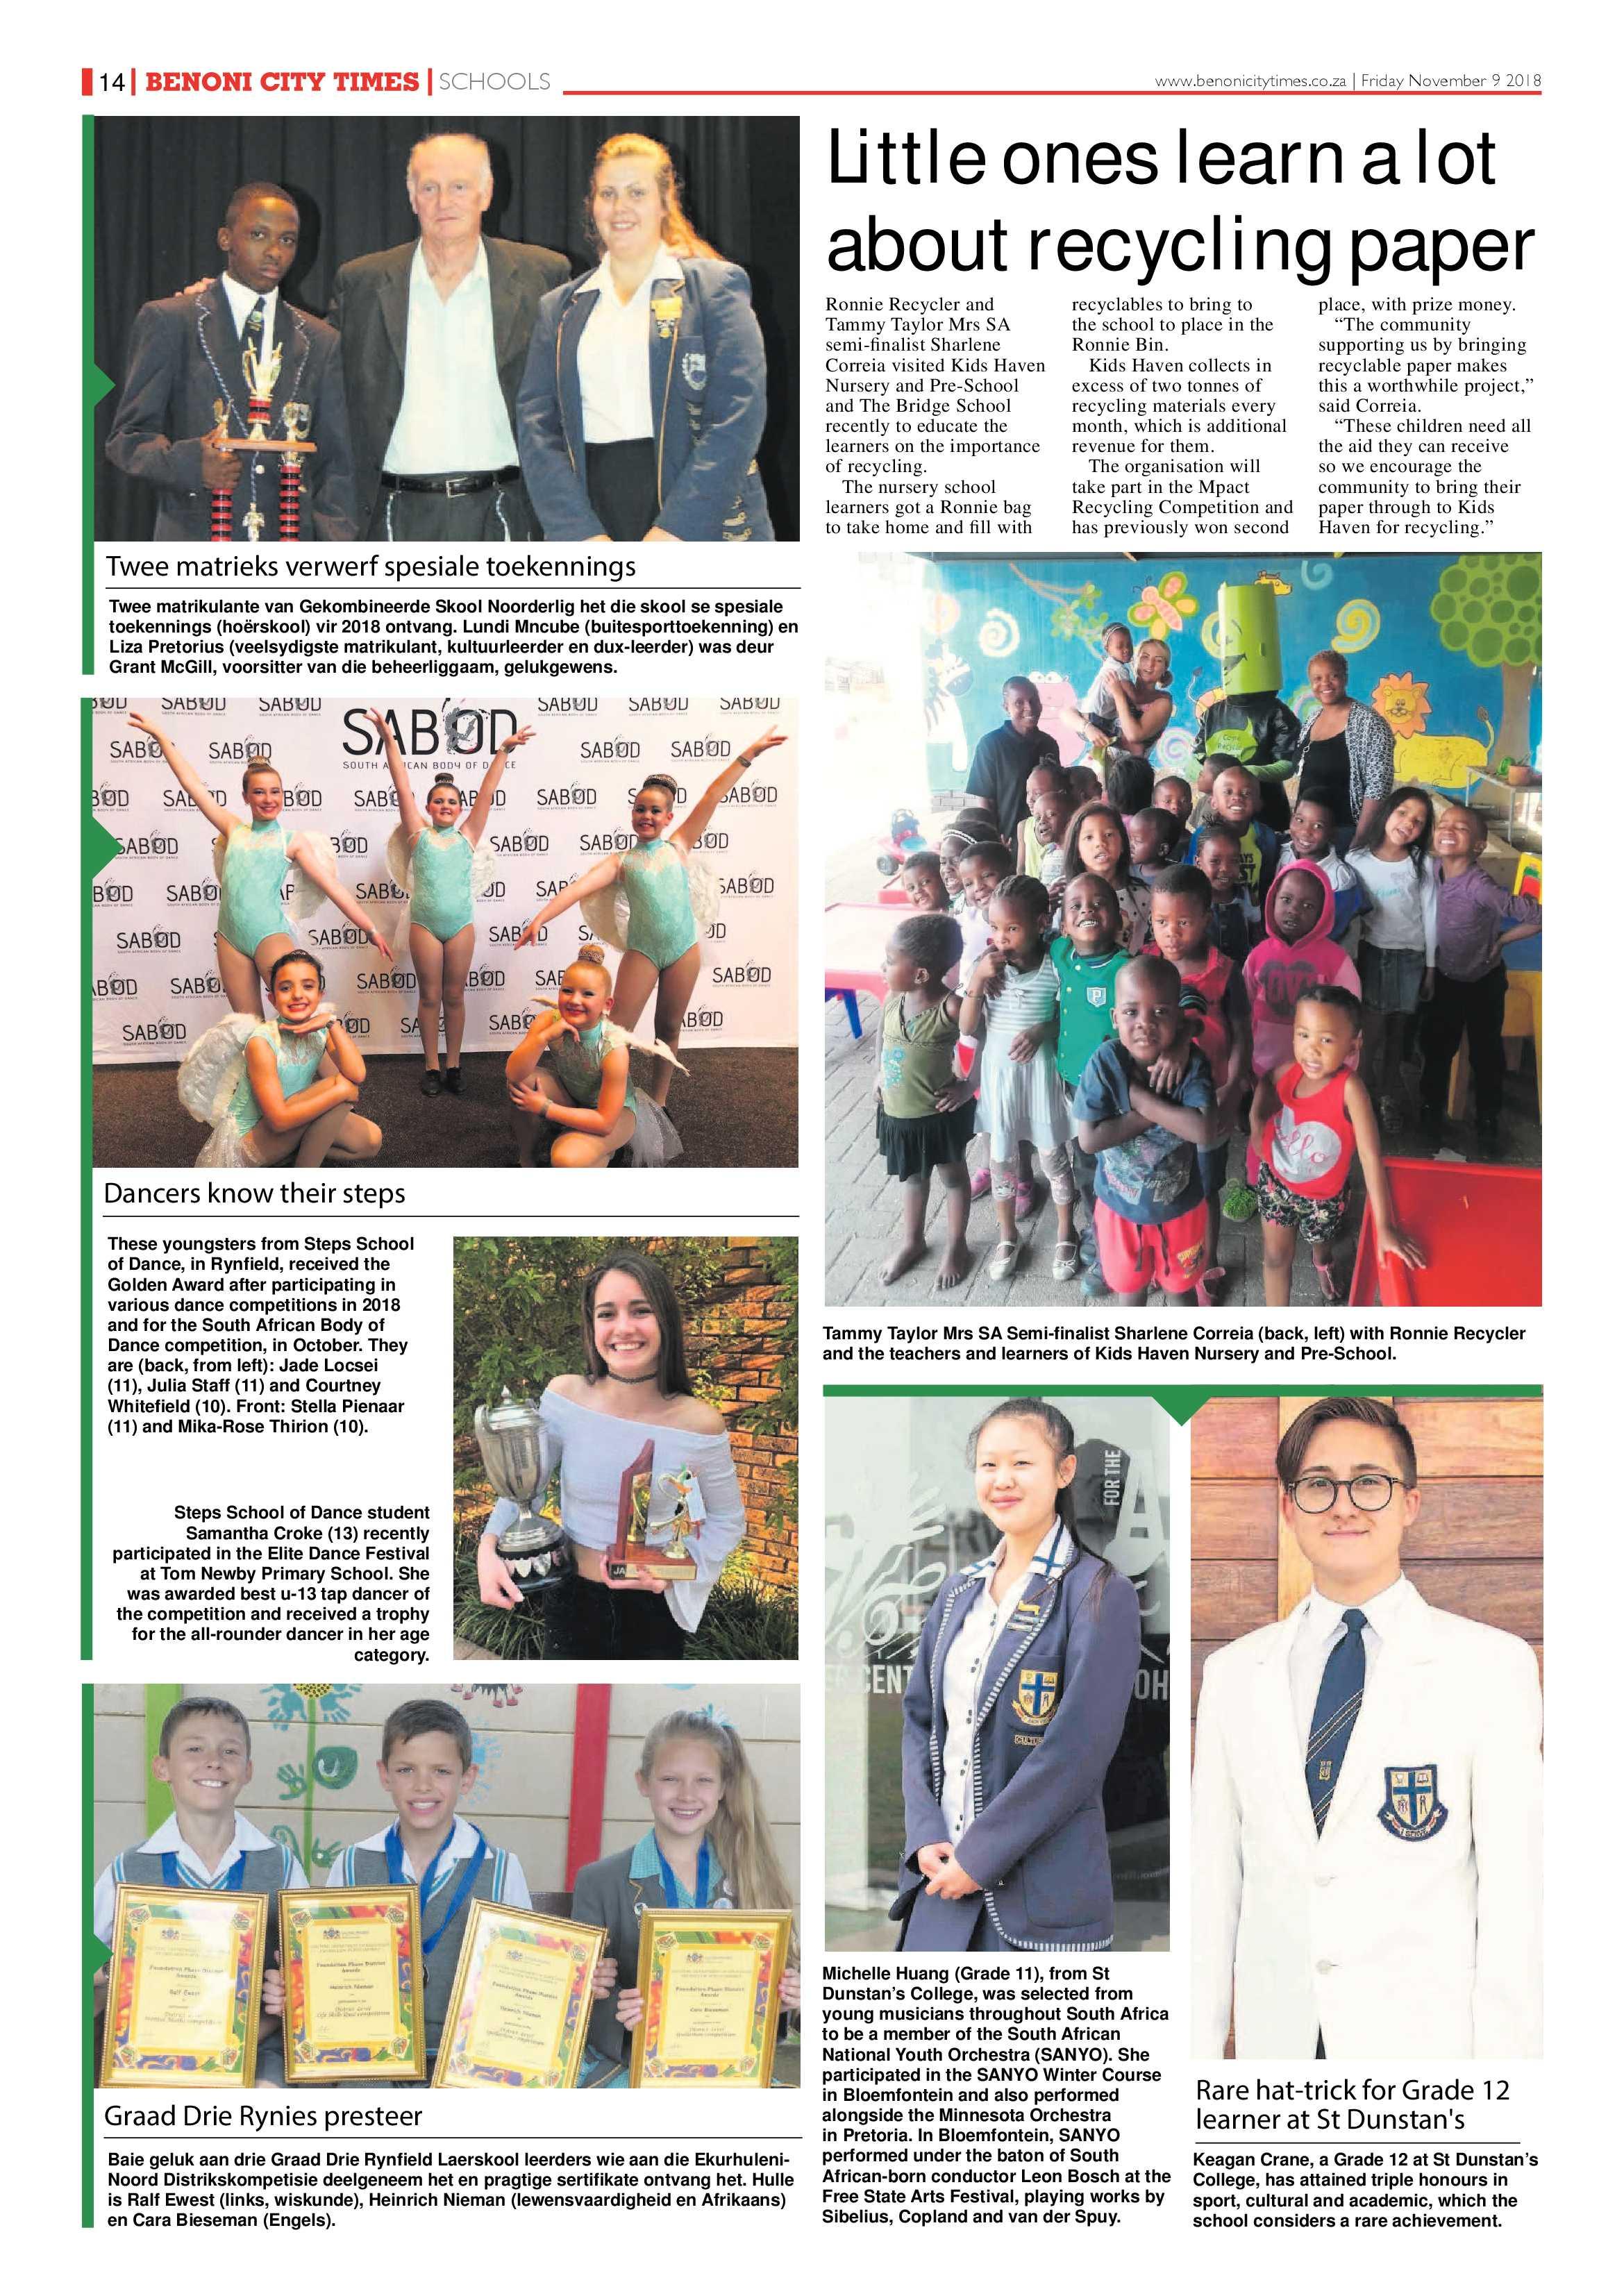 benoni-city-times-08-november-2018-epapers-page-14